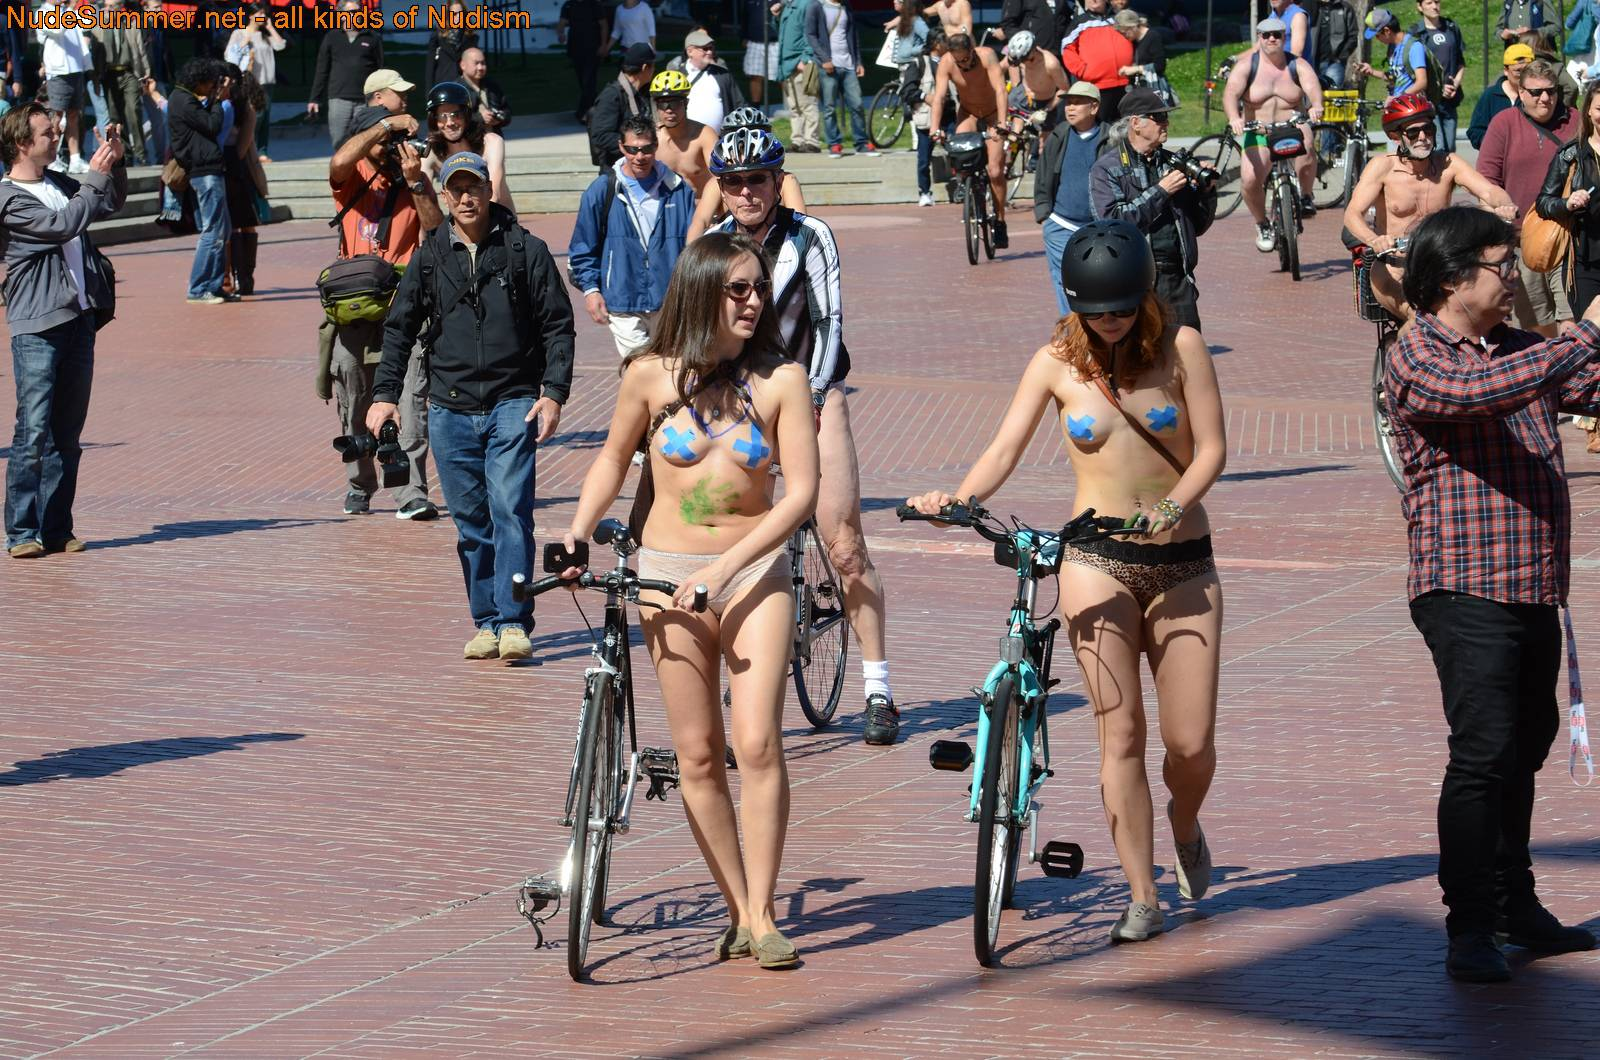 Nudist Gallery World Naked Bike Ride (WNBR) 2013 - 2